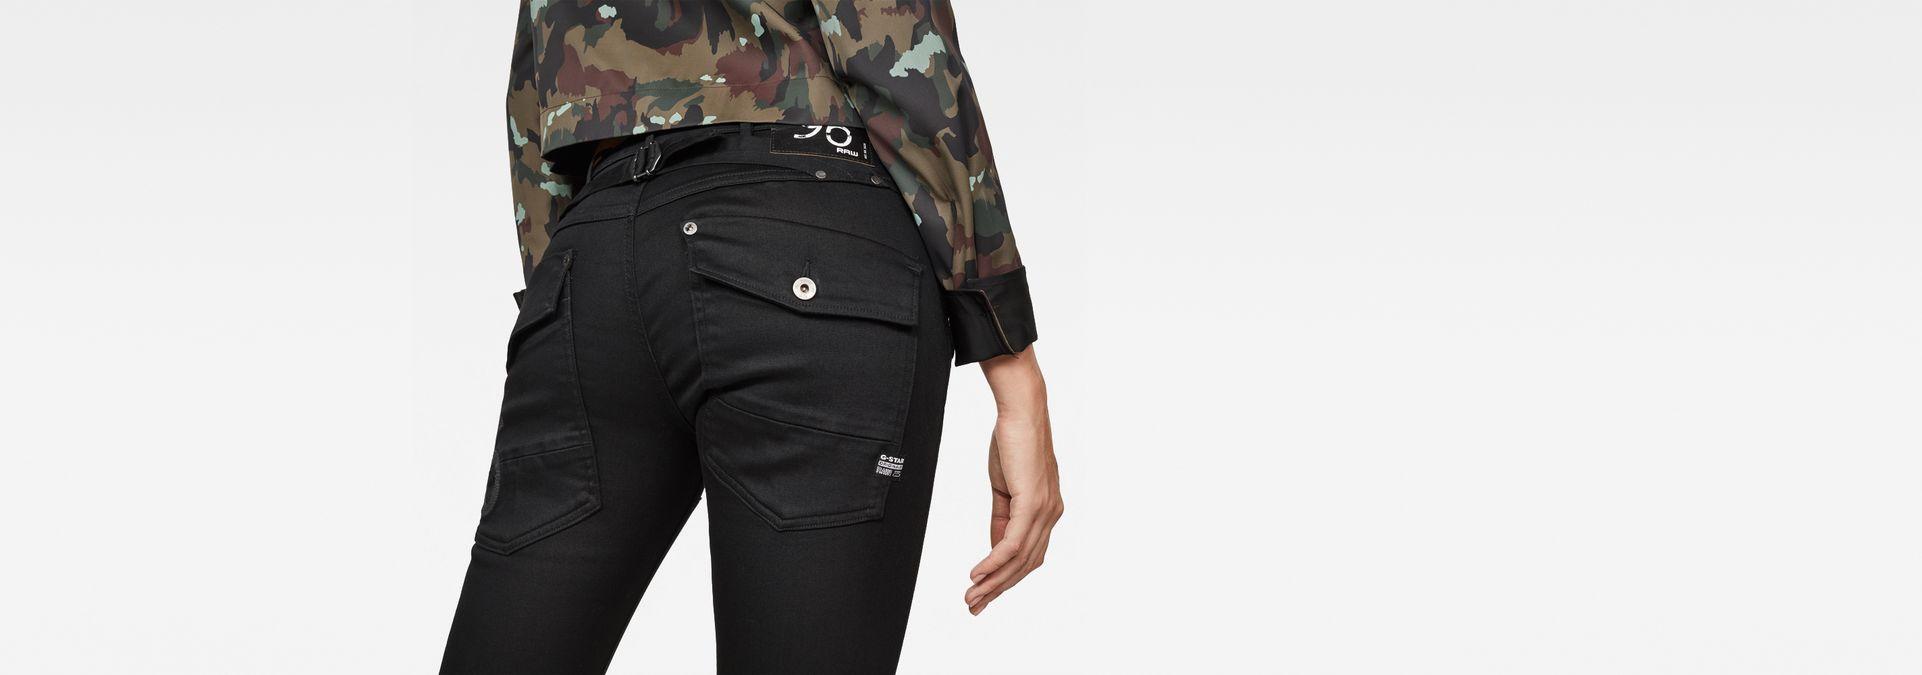 f36a4c31b27 ... G-Star RAW® 5620 G-Star Elwood Heritage Embro Tapered Jeans Black ...